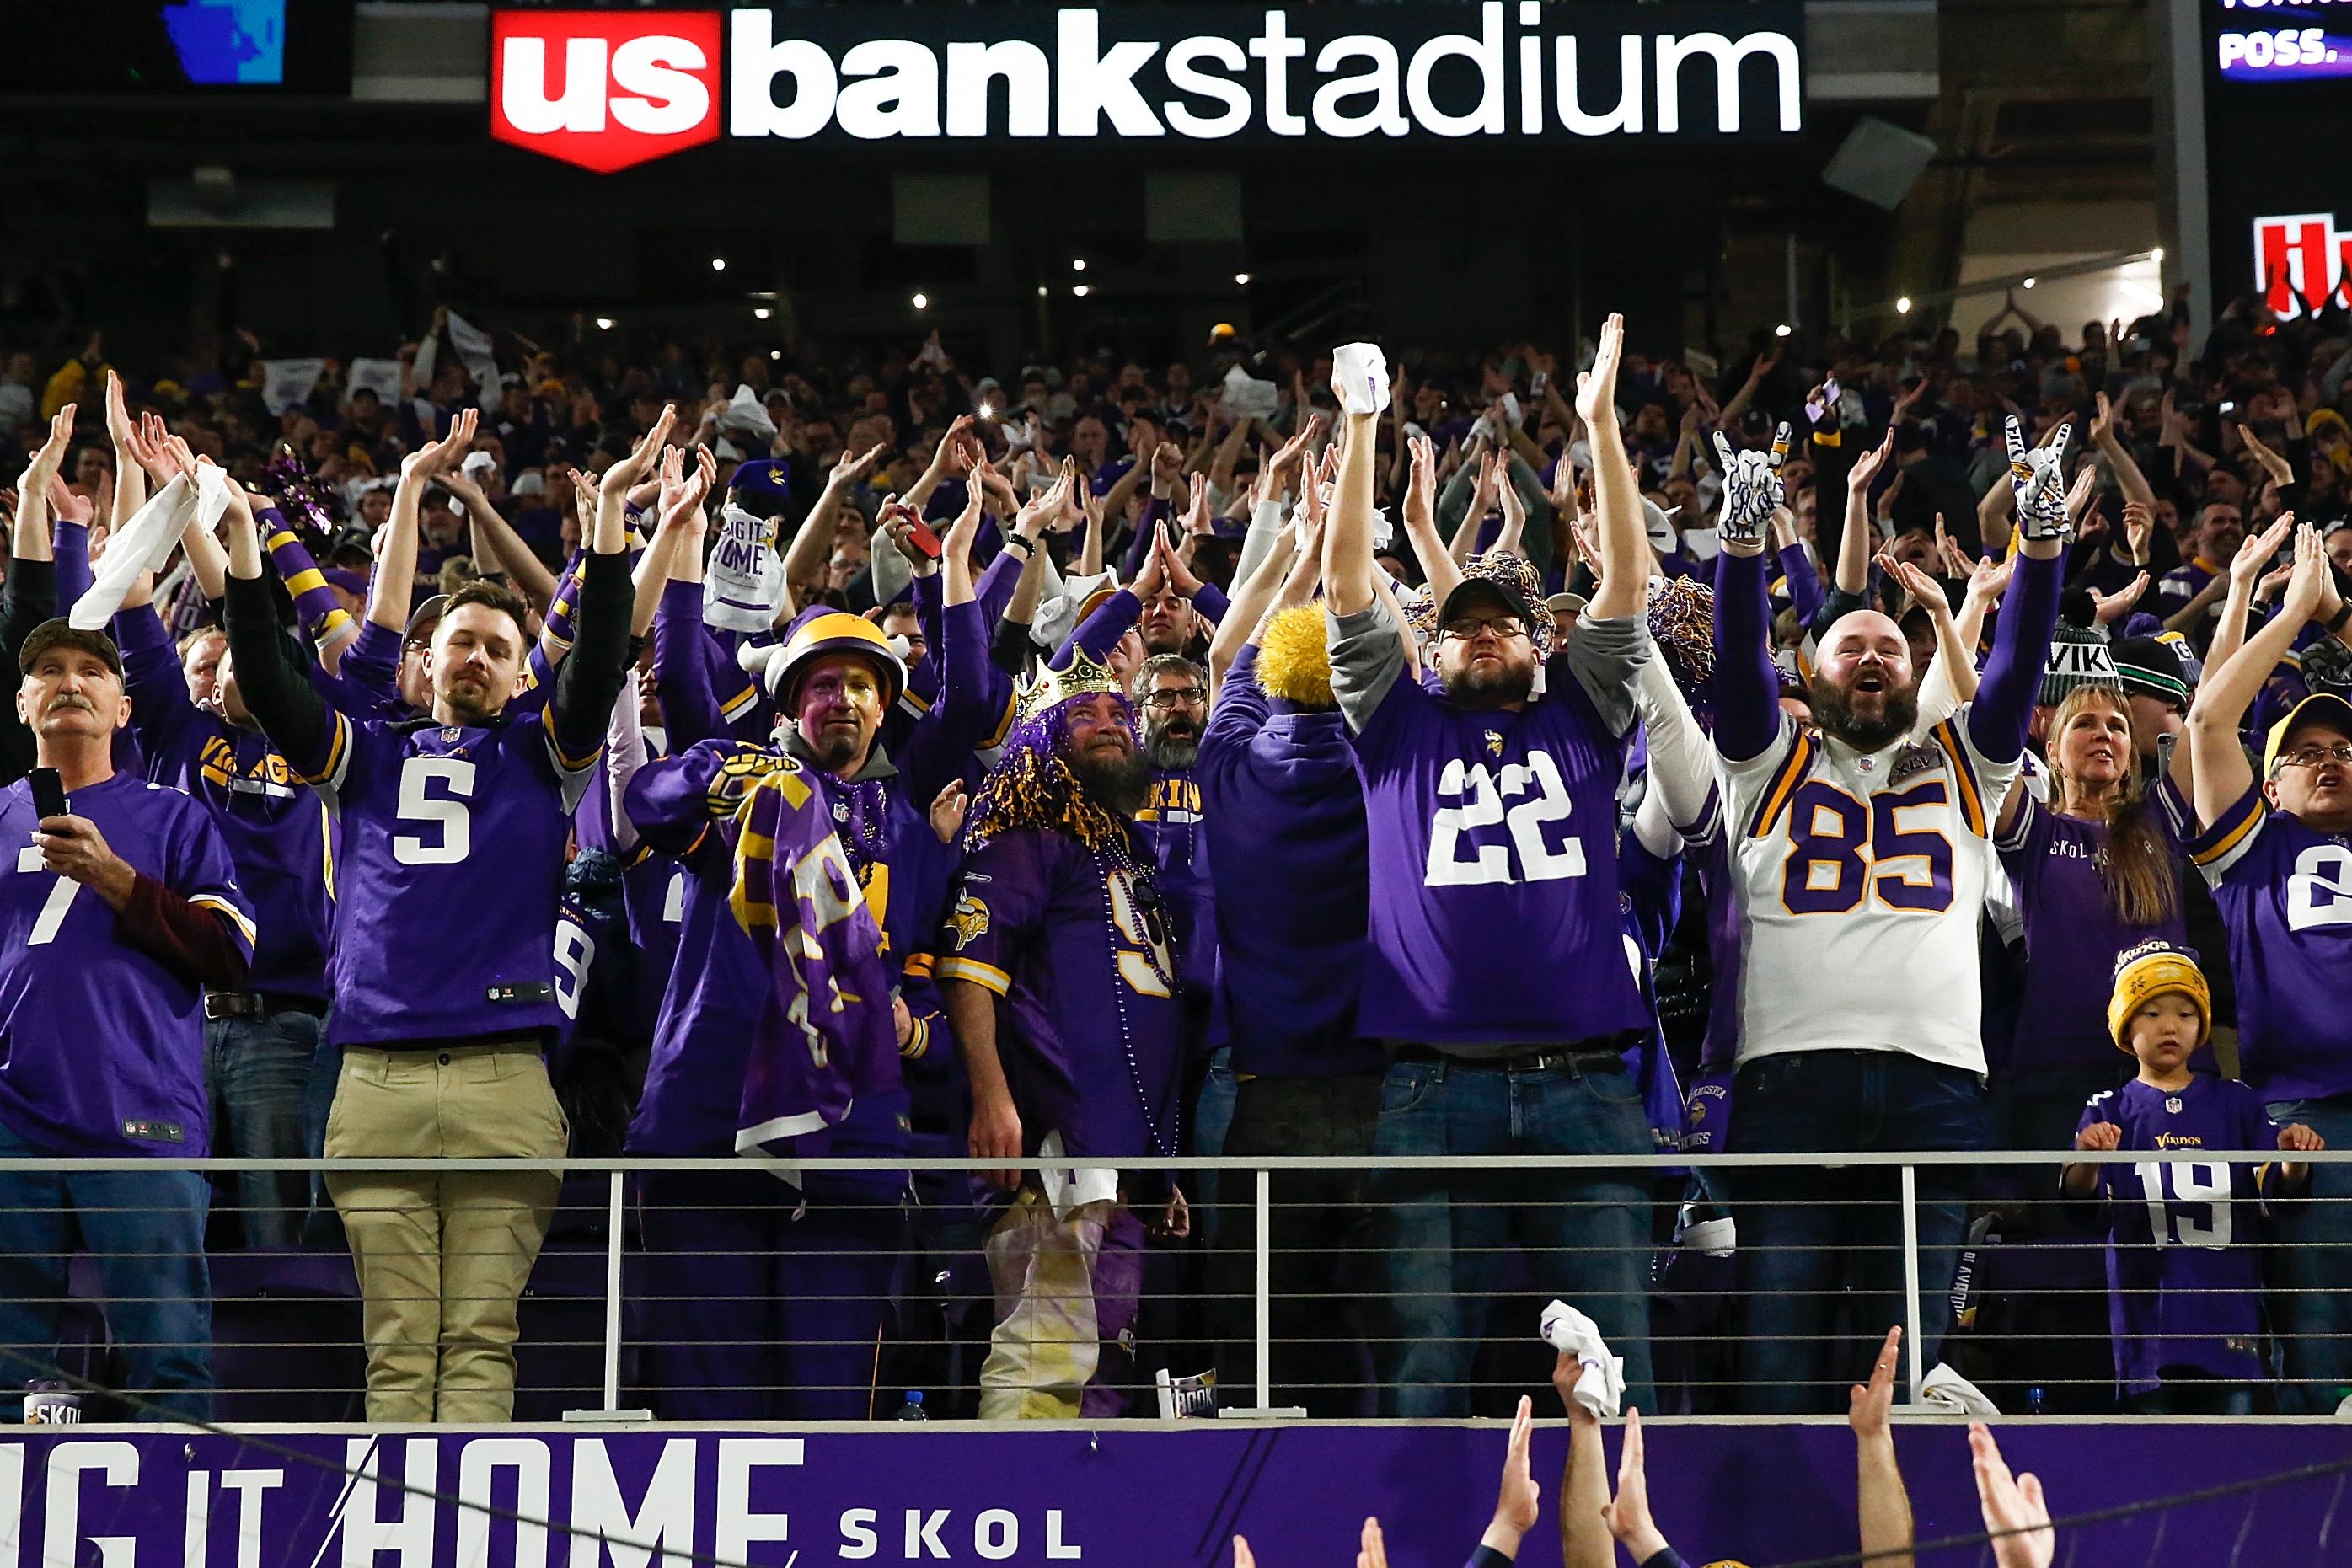 venganza, aficionados, Vikings, Minnesota, contra, Philadelphia, Eagles, previo, Super Bowl LII, por eliminarlos, NFL